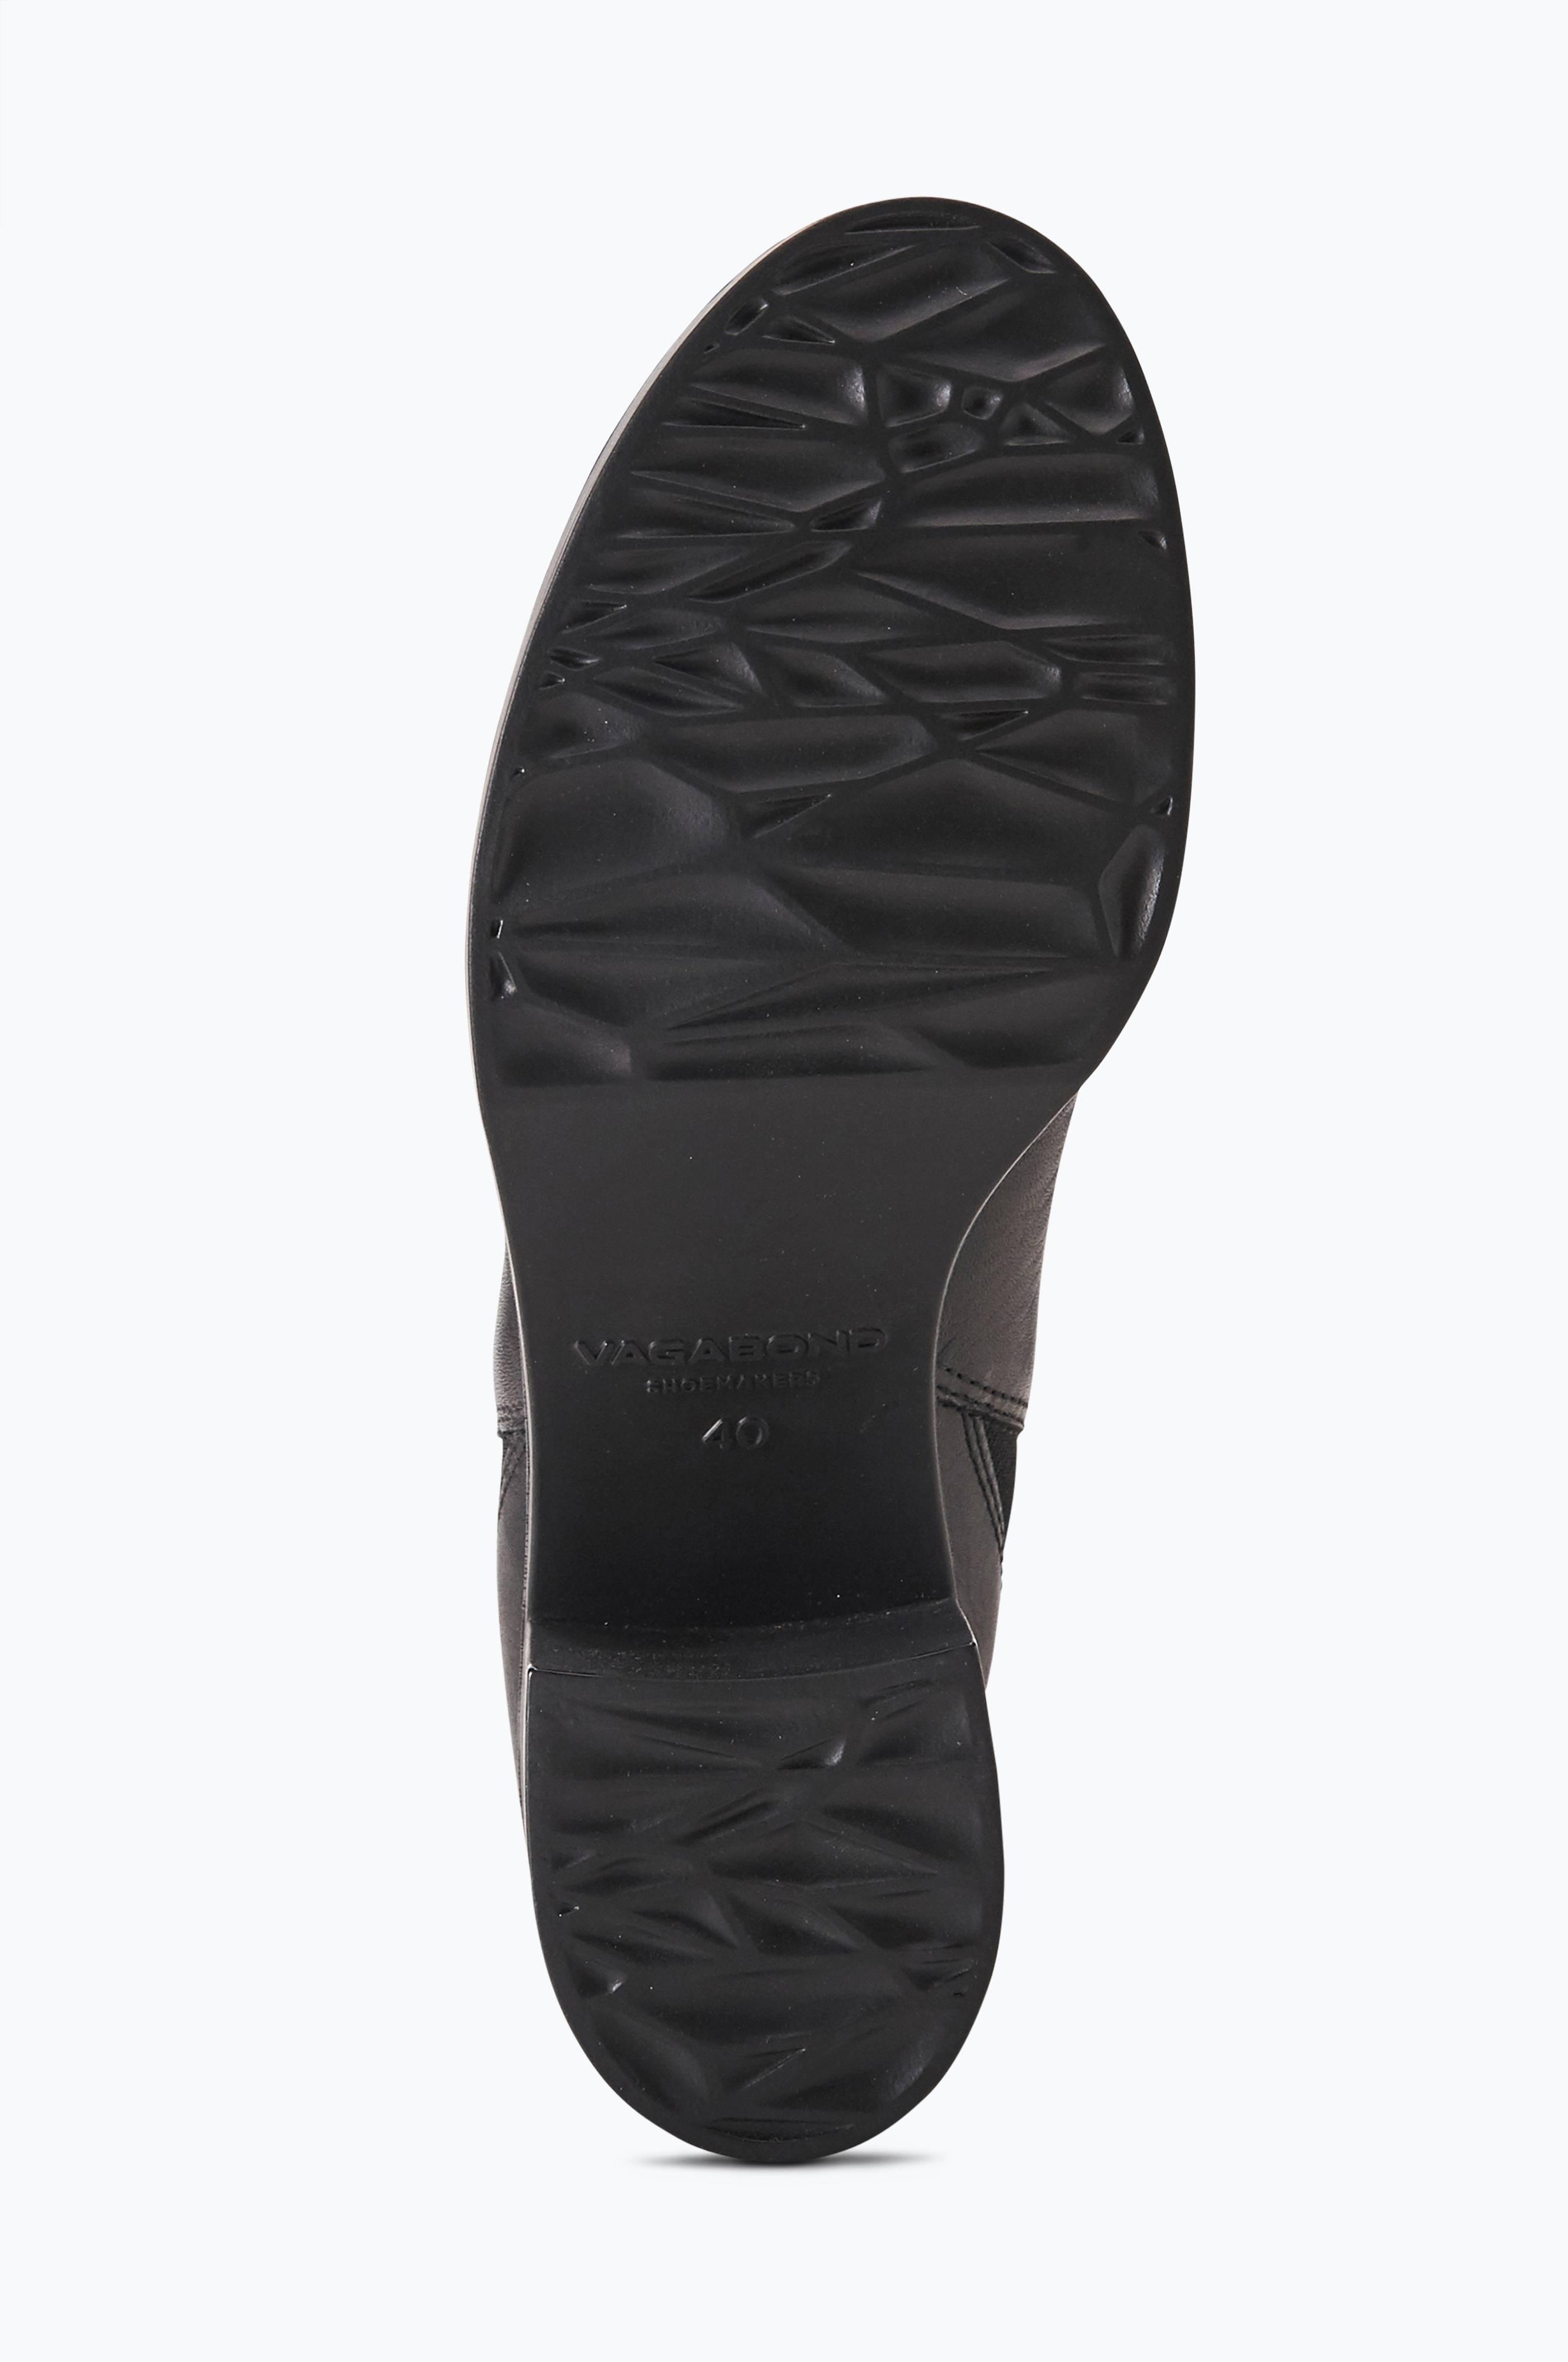 Vagabond Støvler Tilda med elastisk skaft Sort Dame